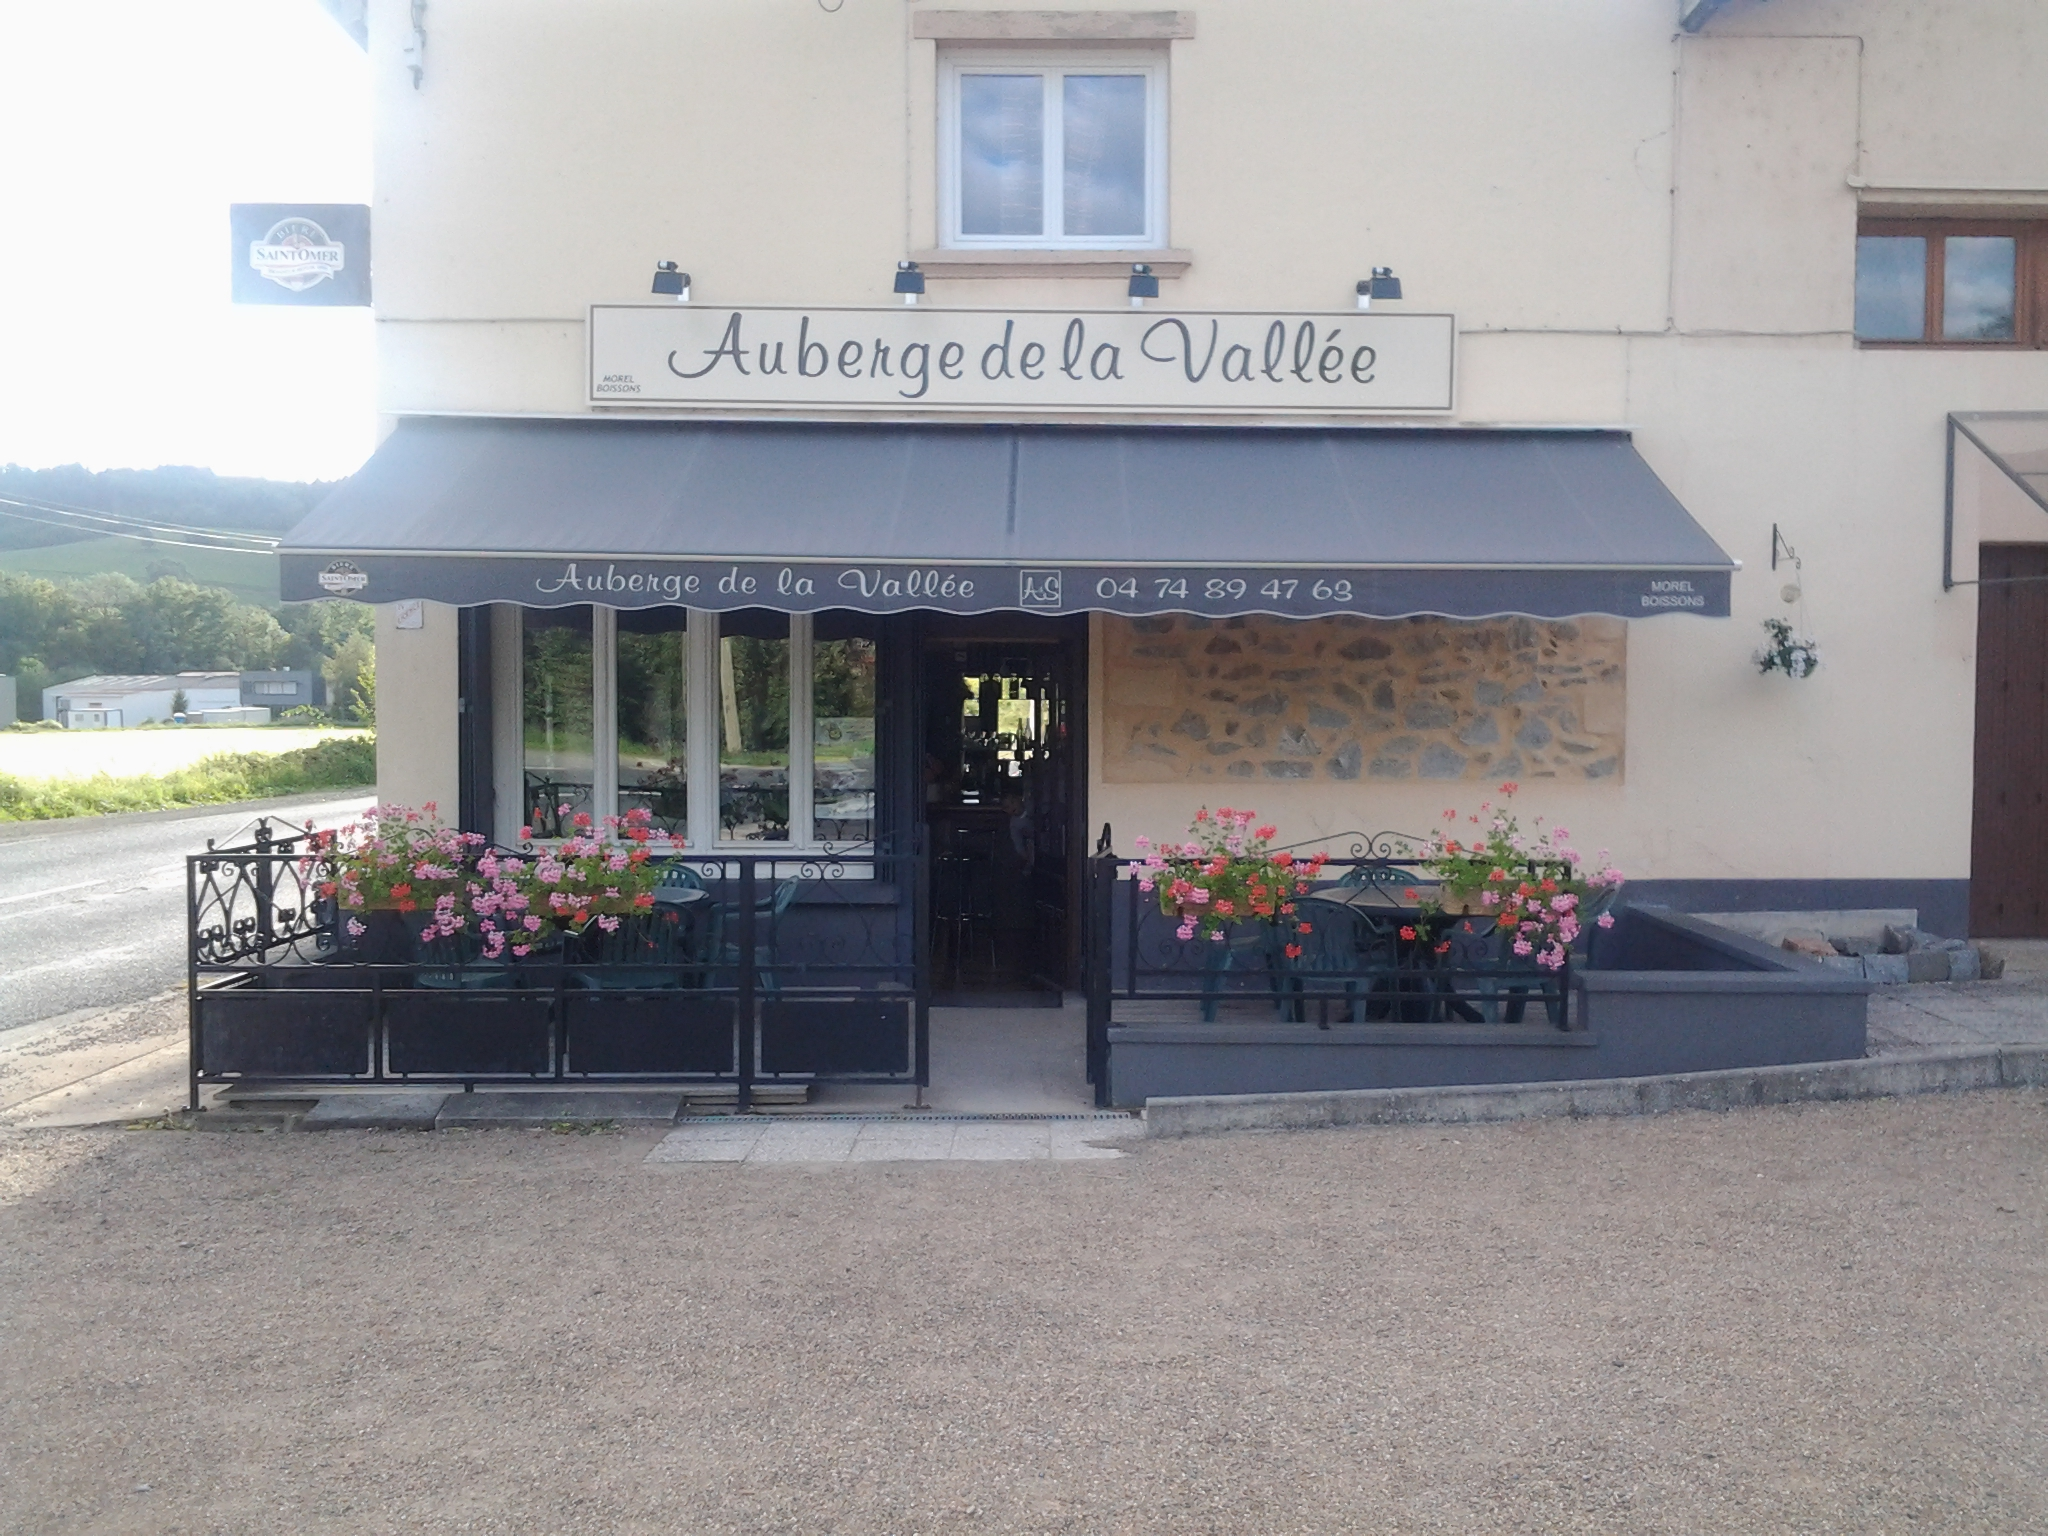 Auberge de la vall e beaujolais vert site officiel de - Site officiel office de tourisme de cauterets ...